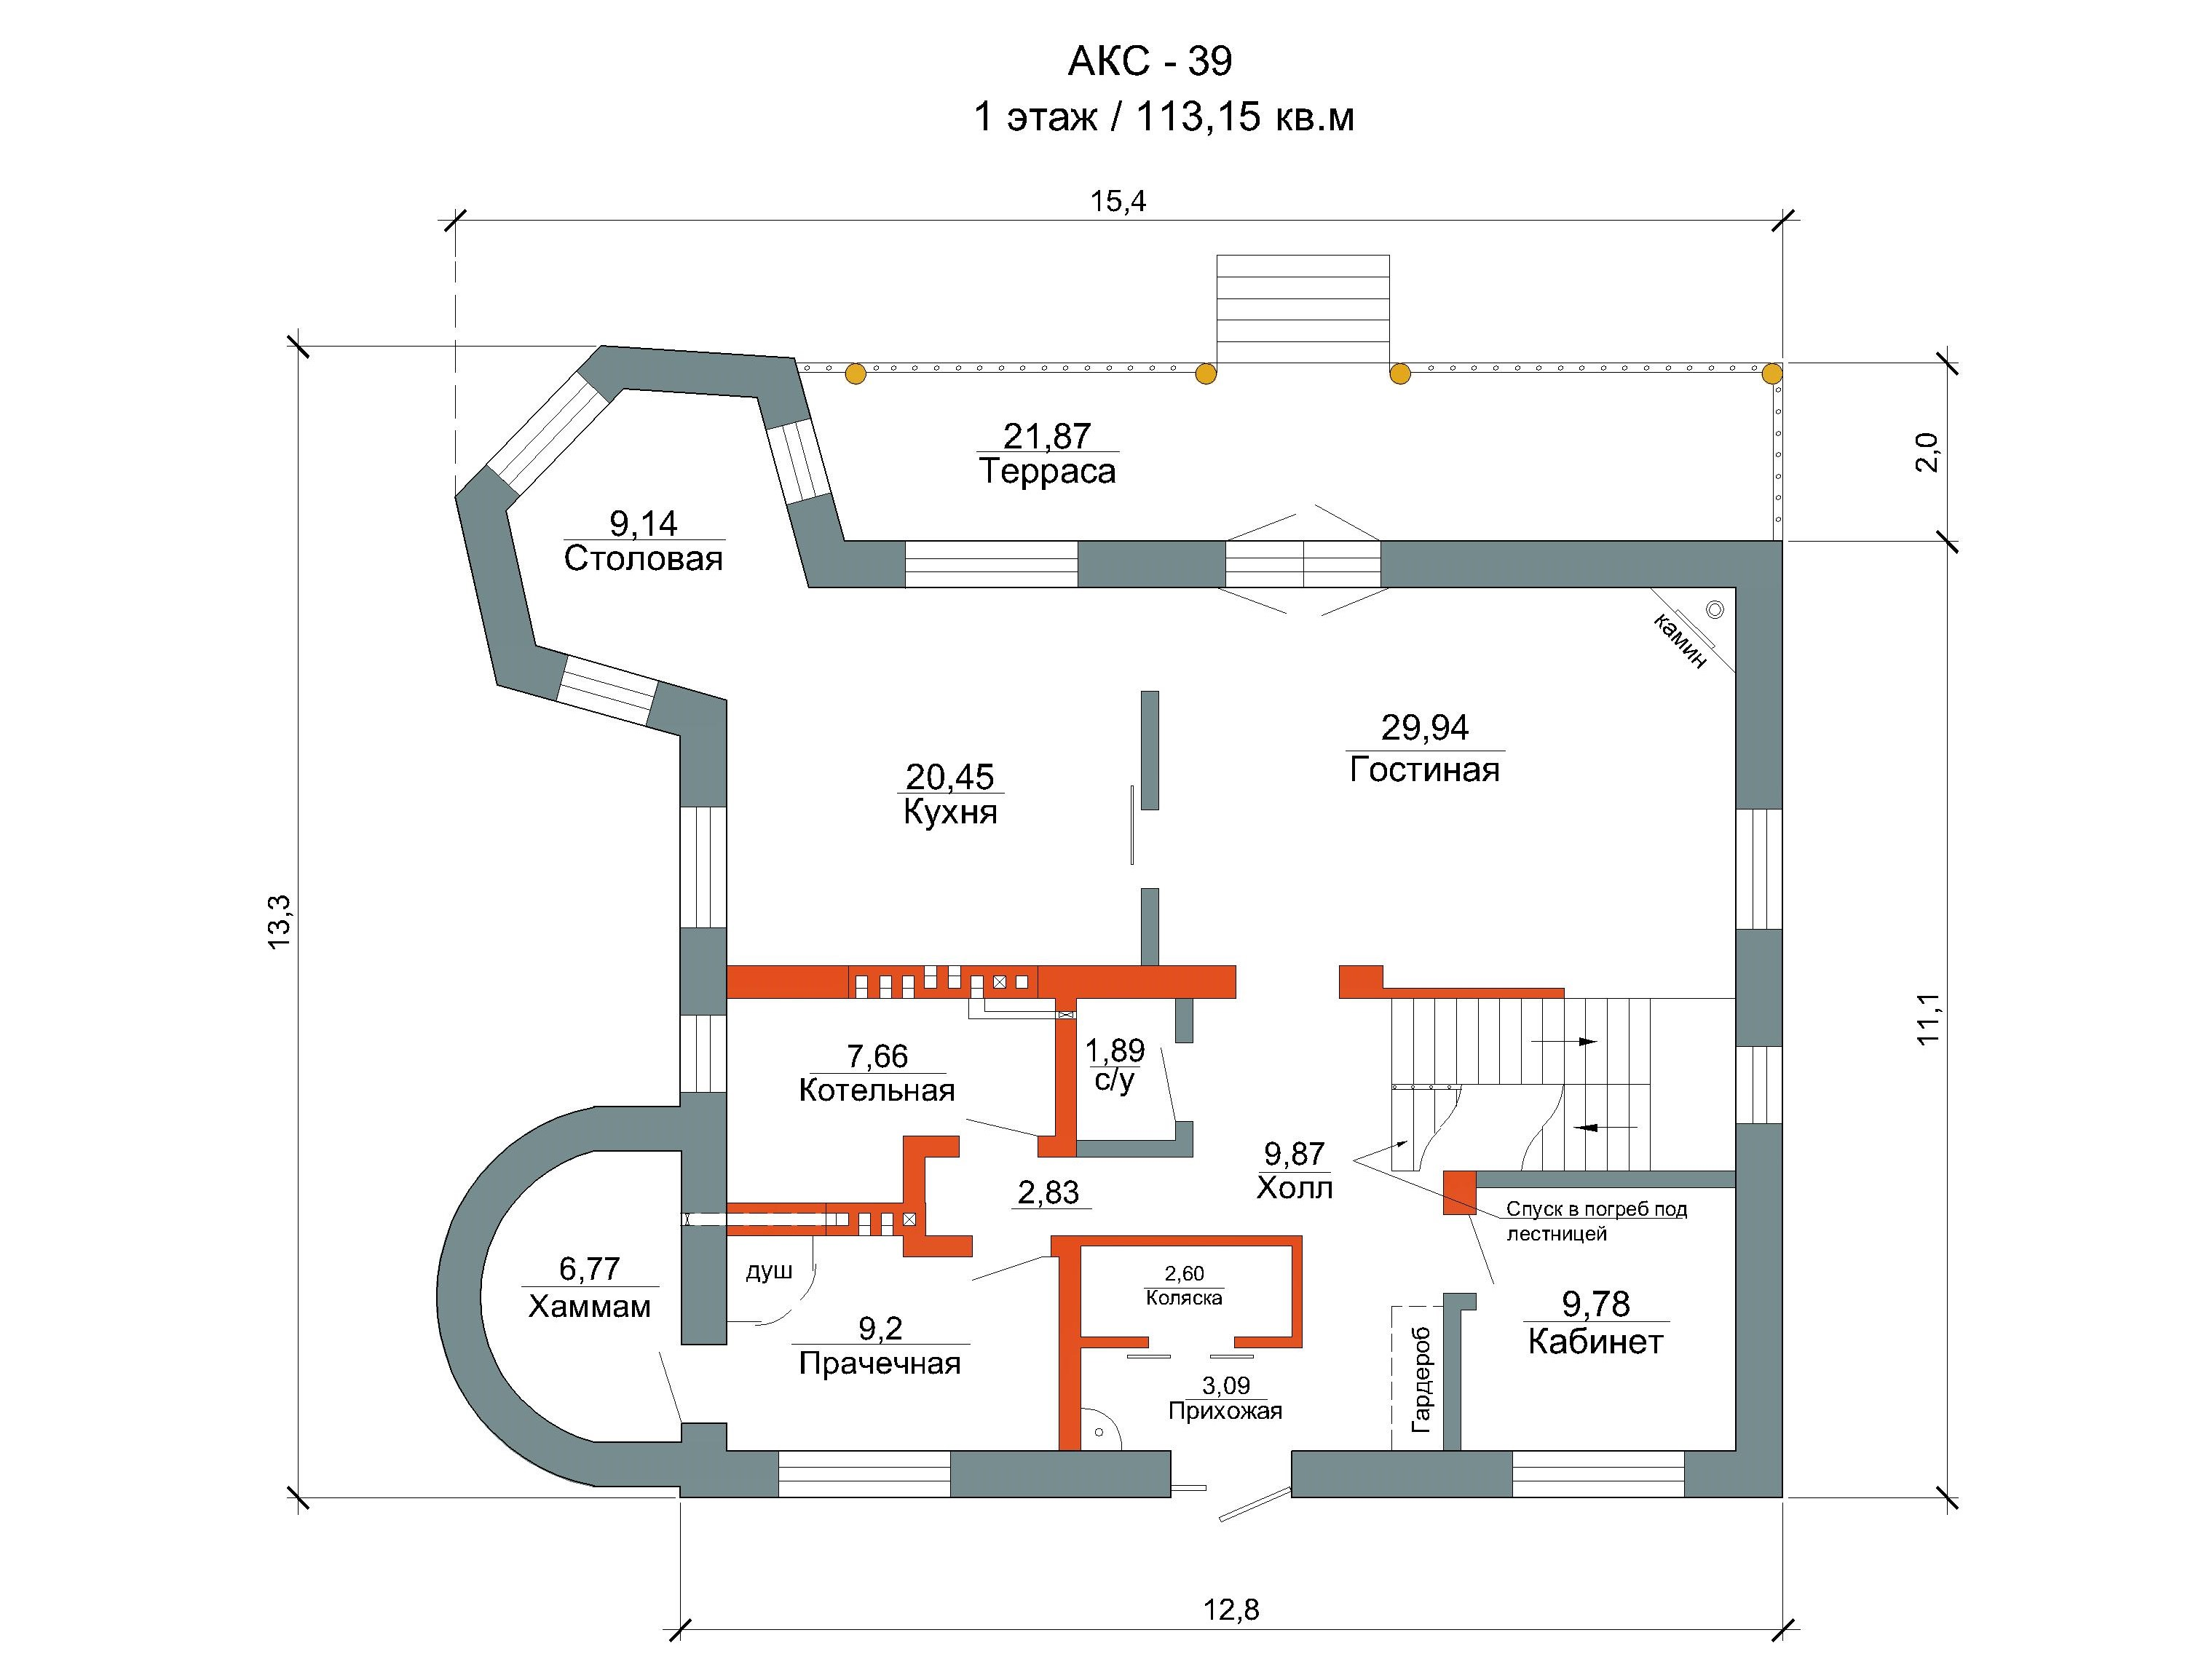 Готовый проект коттеджа 228 кв. м / Артикул AKC-39 план